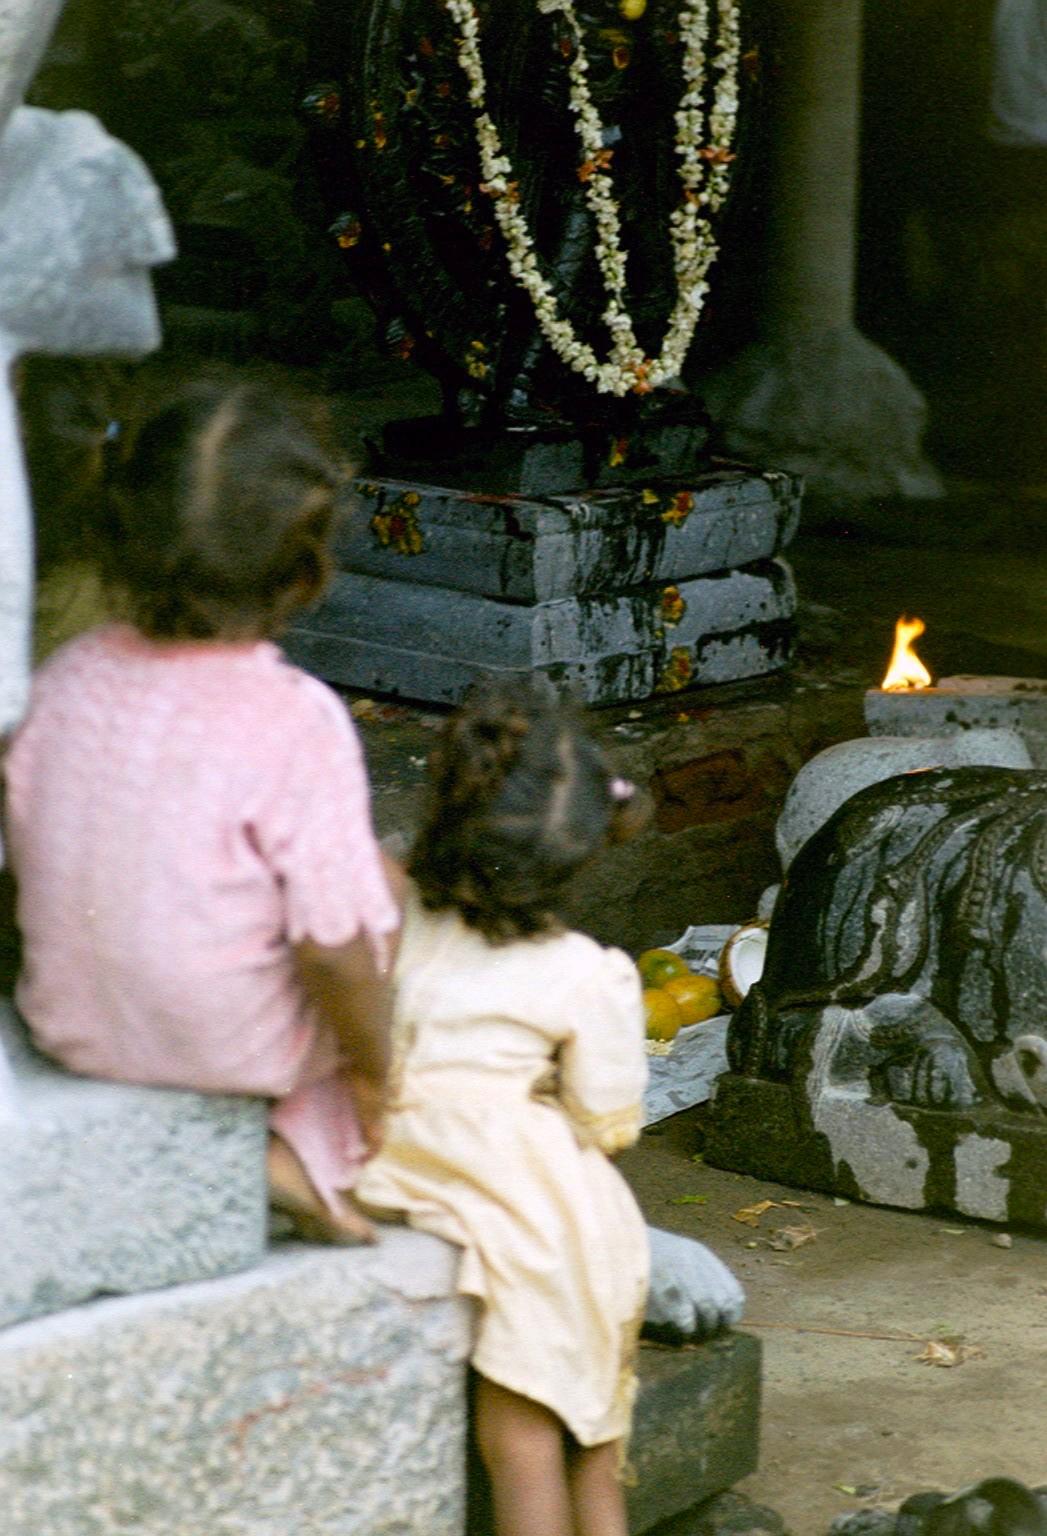 India, Mahaballapuram